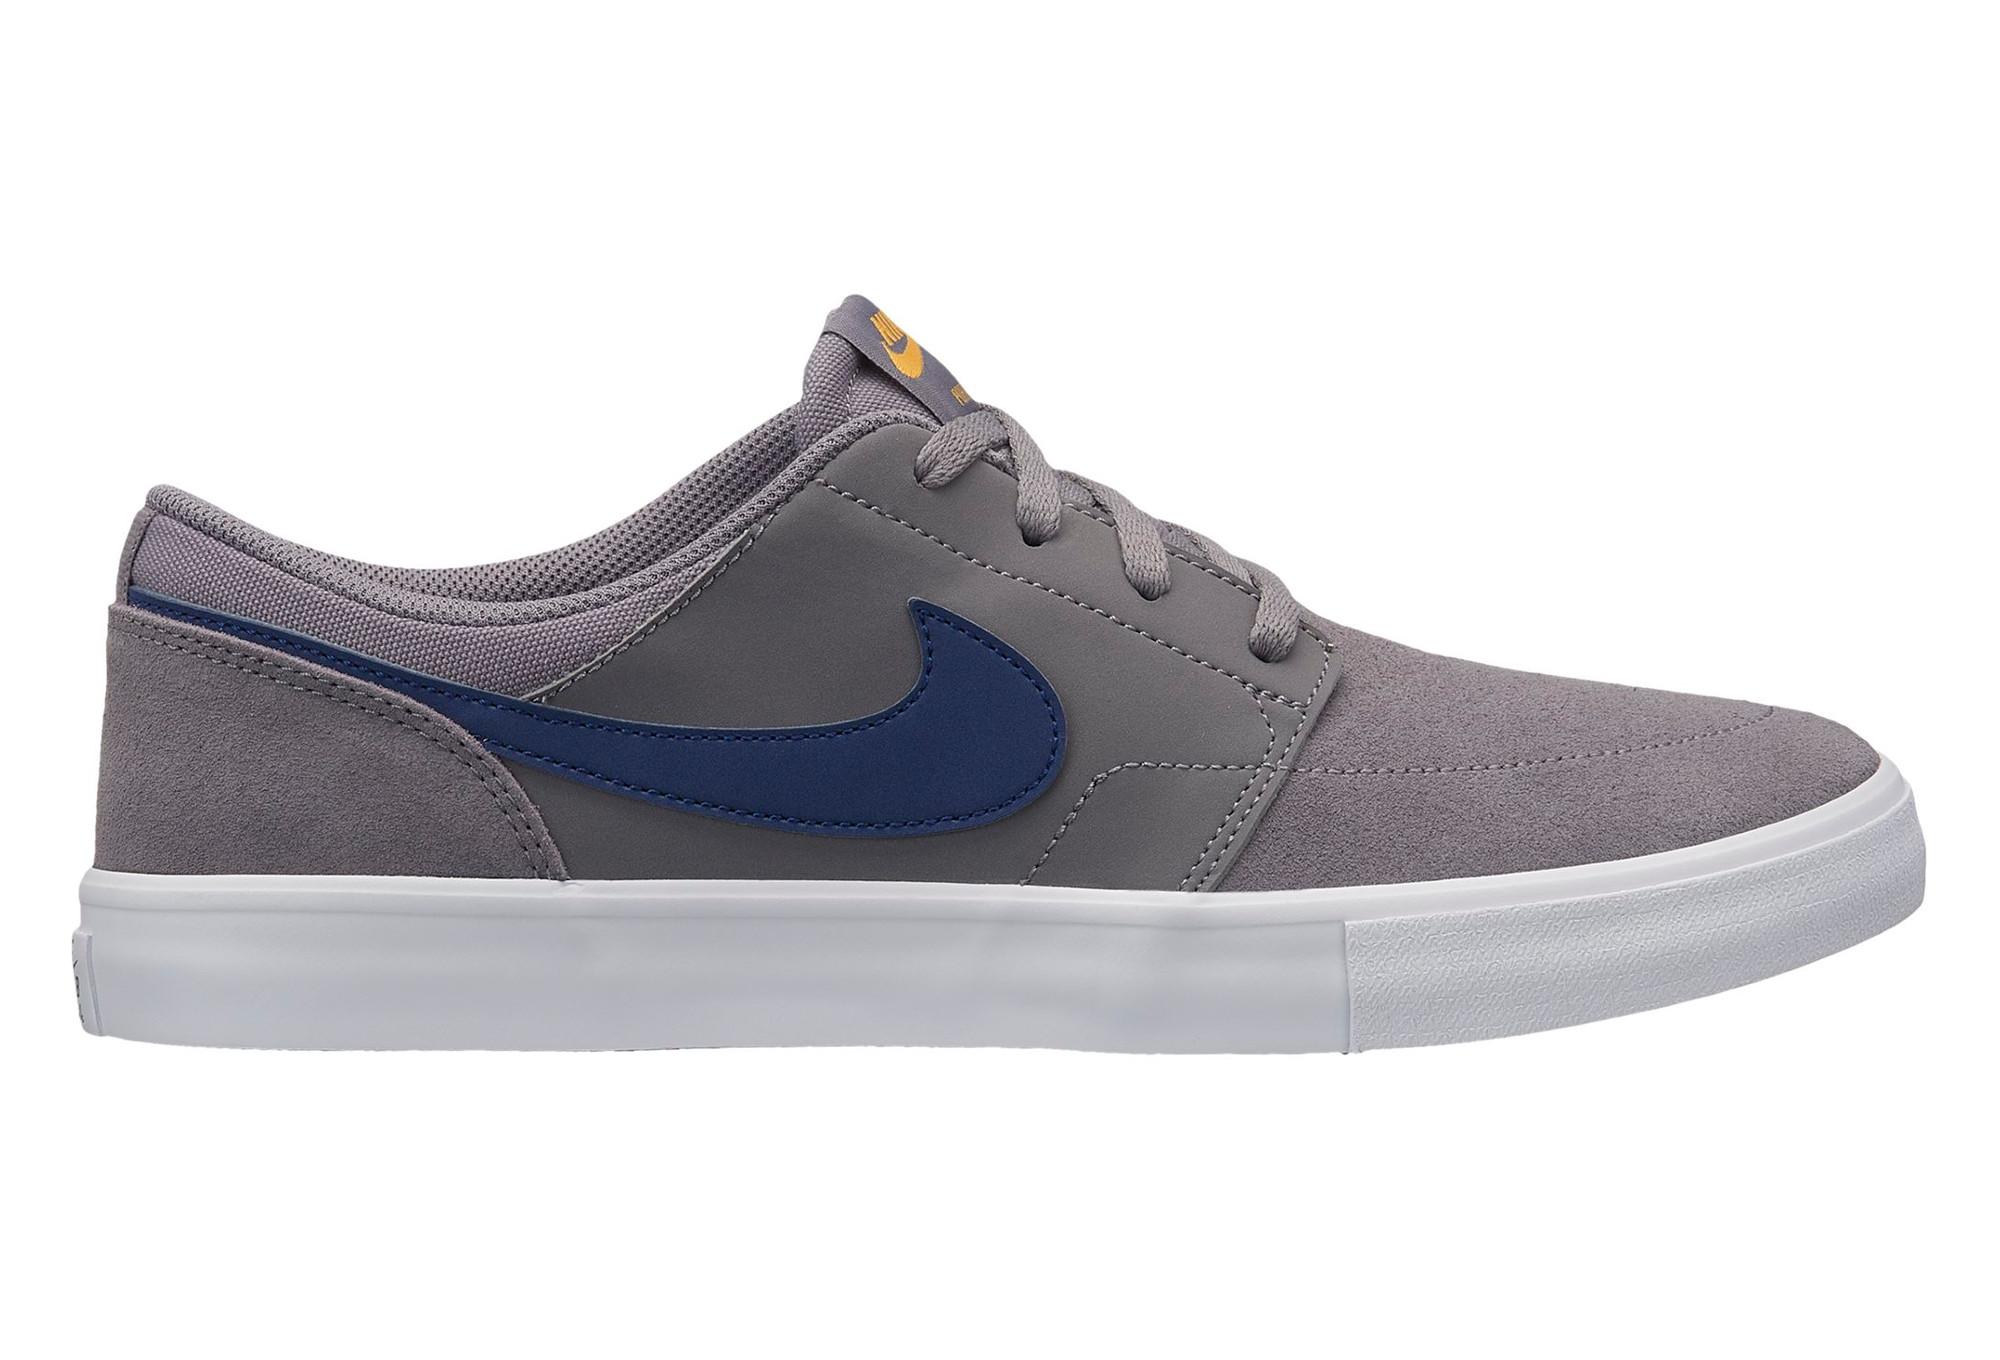 Nike SB Solarsoft Portmore II Shoes Grey Blue  754bb842e026